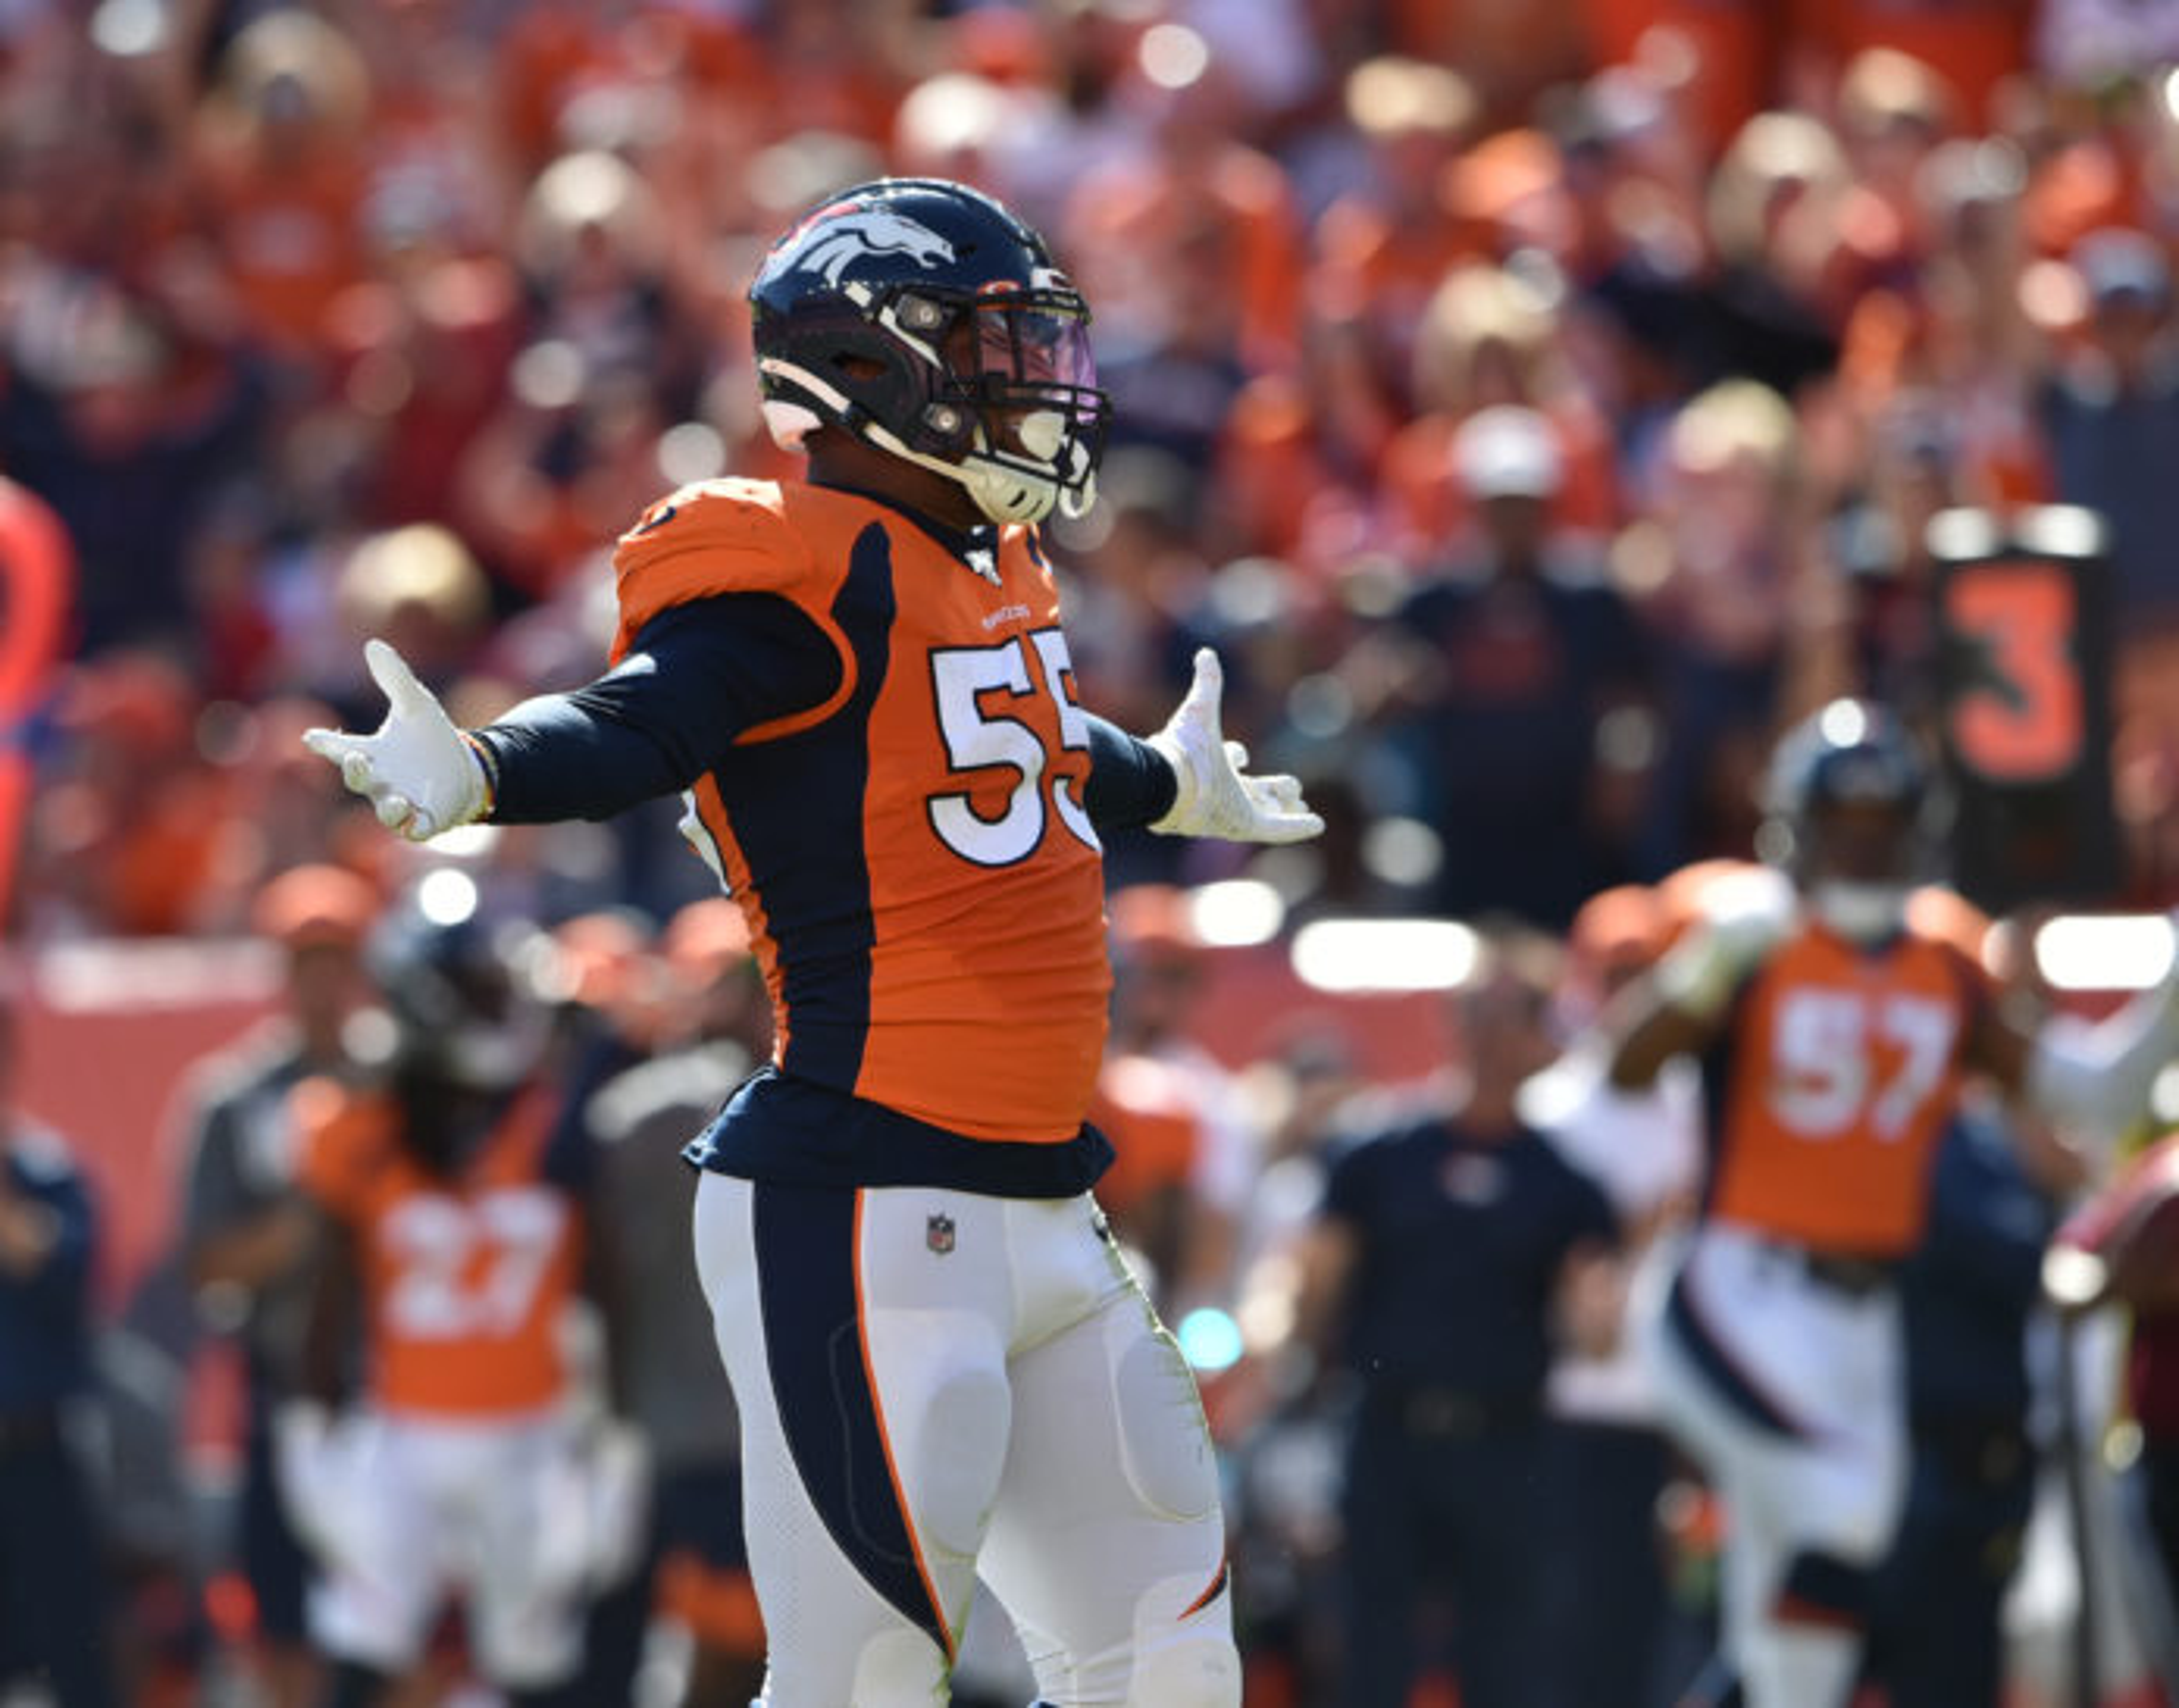 Denver Broncos outside linebacker Bradley Chubb (55) celebrates sacking Jacksonville Jaguars quarterback Gardner Minshew (15) in the second quarter at Empower Field at Mile High.